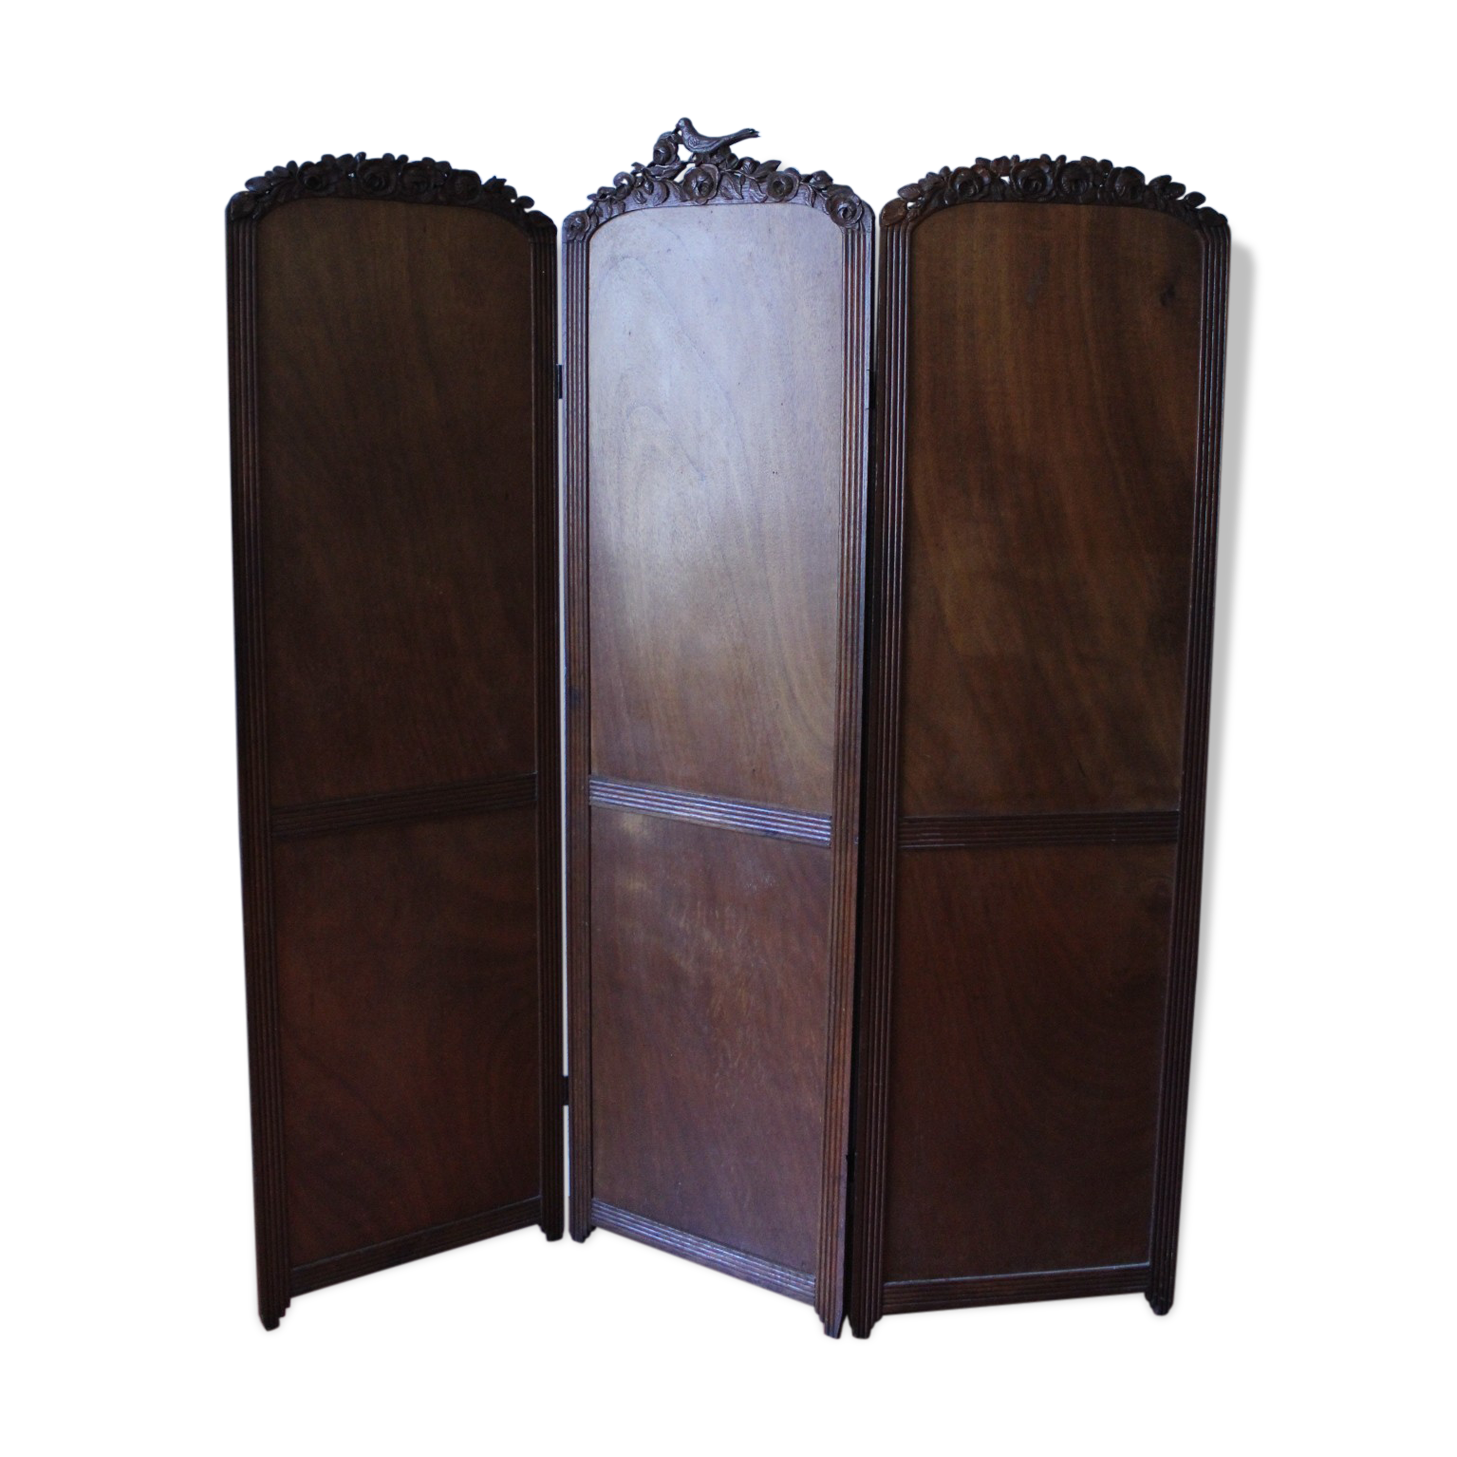 pare vent interieur decoration best vendu par jardin deco paravent roma kare design kare design. Black Bedroom Furniture Sets. Home Design Ideas